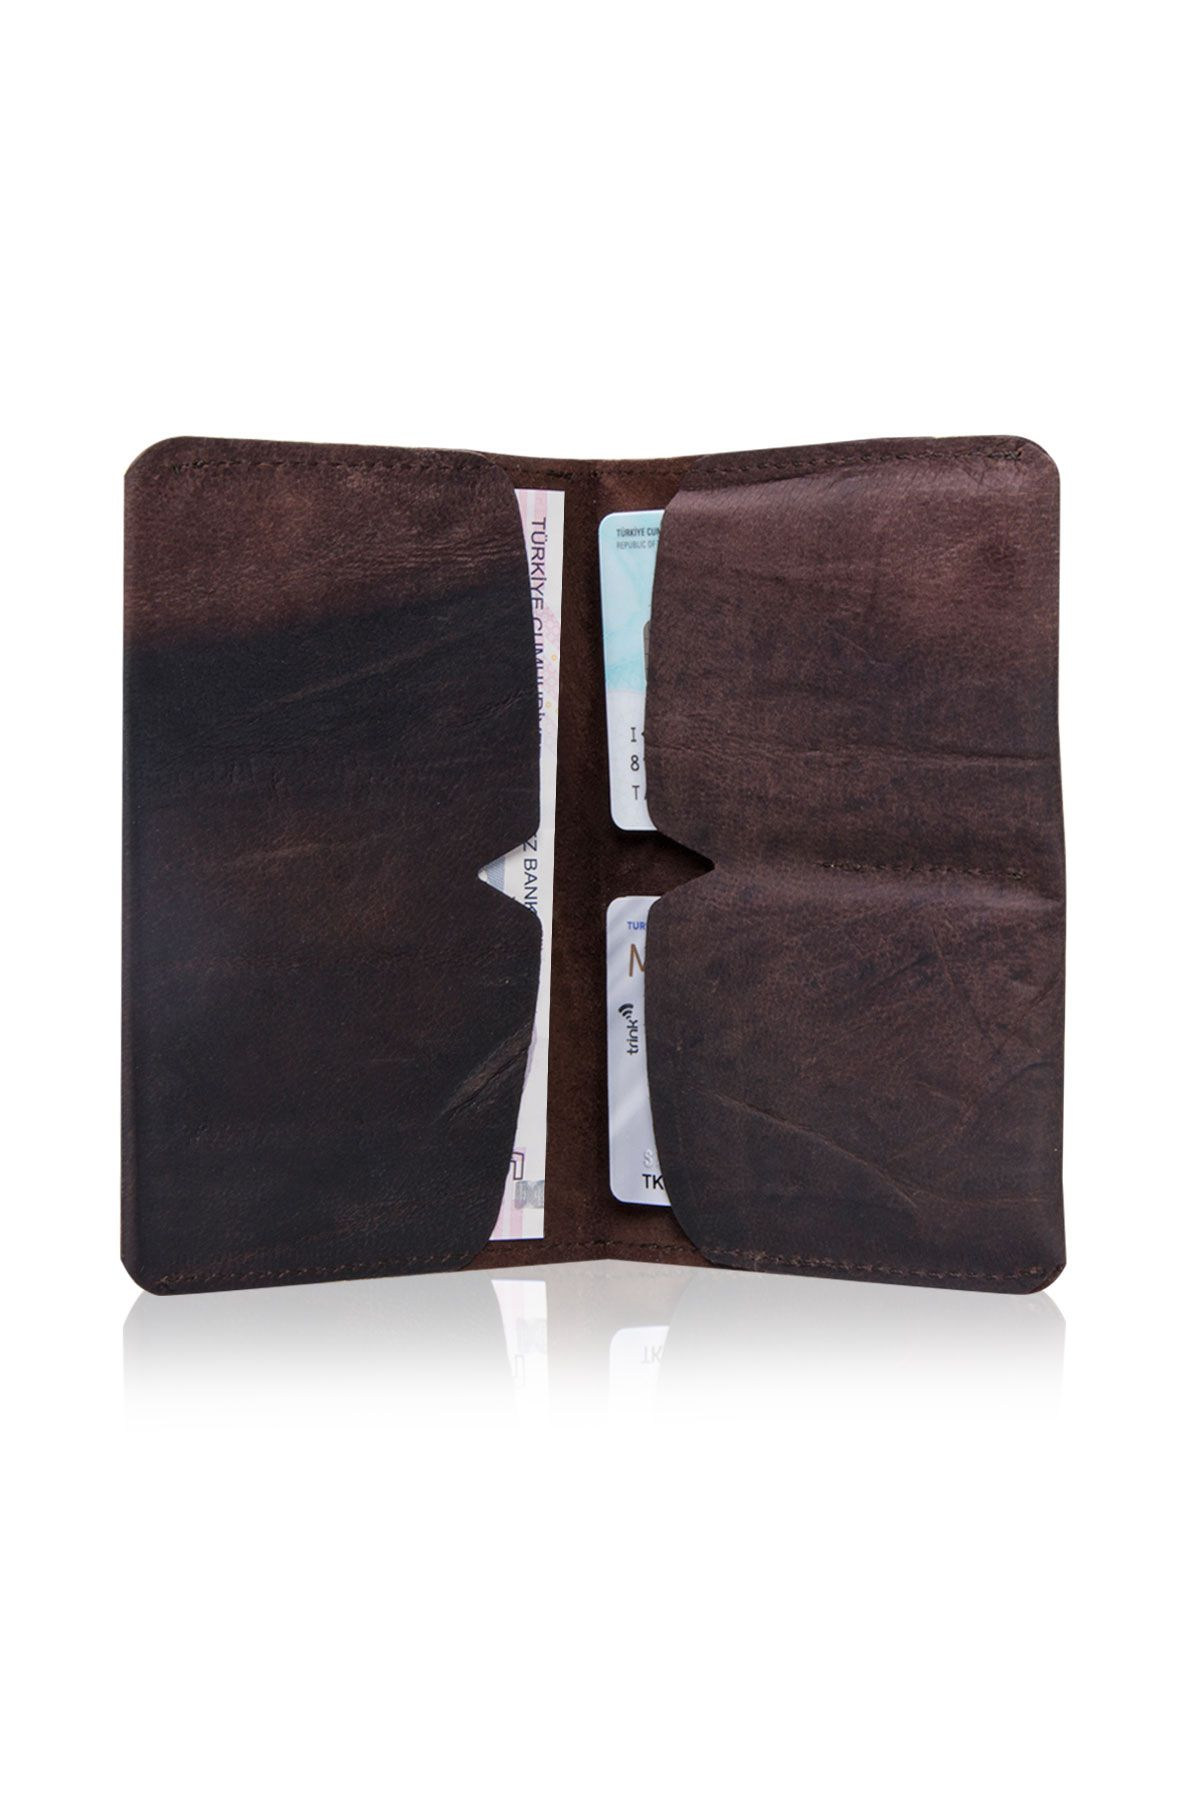 Pegia Genuine Leather Vintage Wallet 19CZ305 Brown